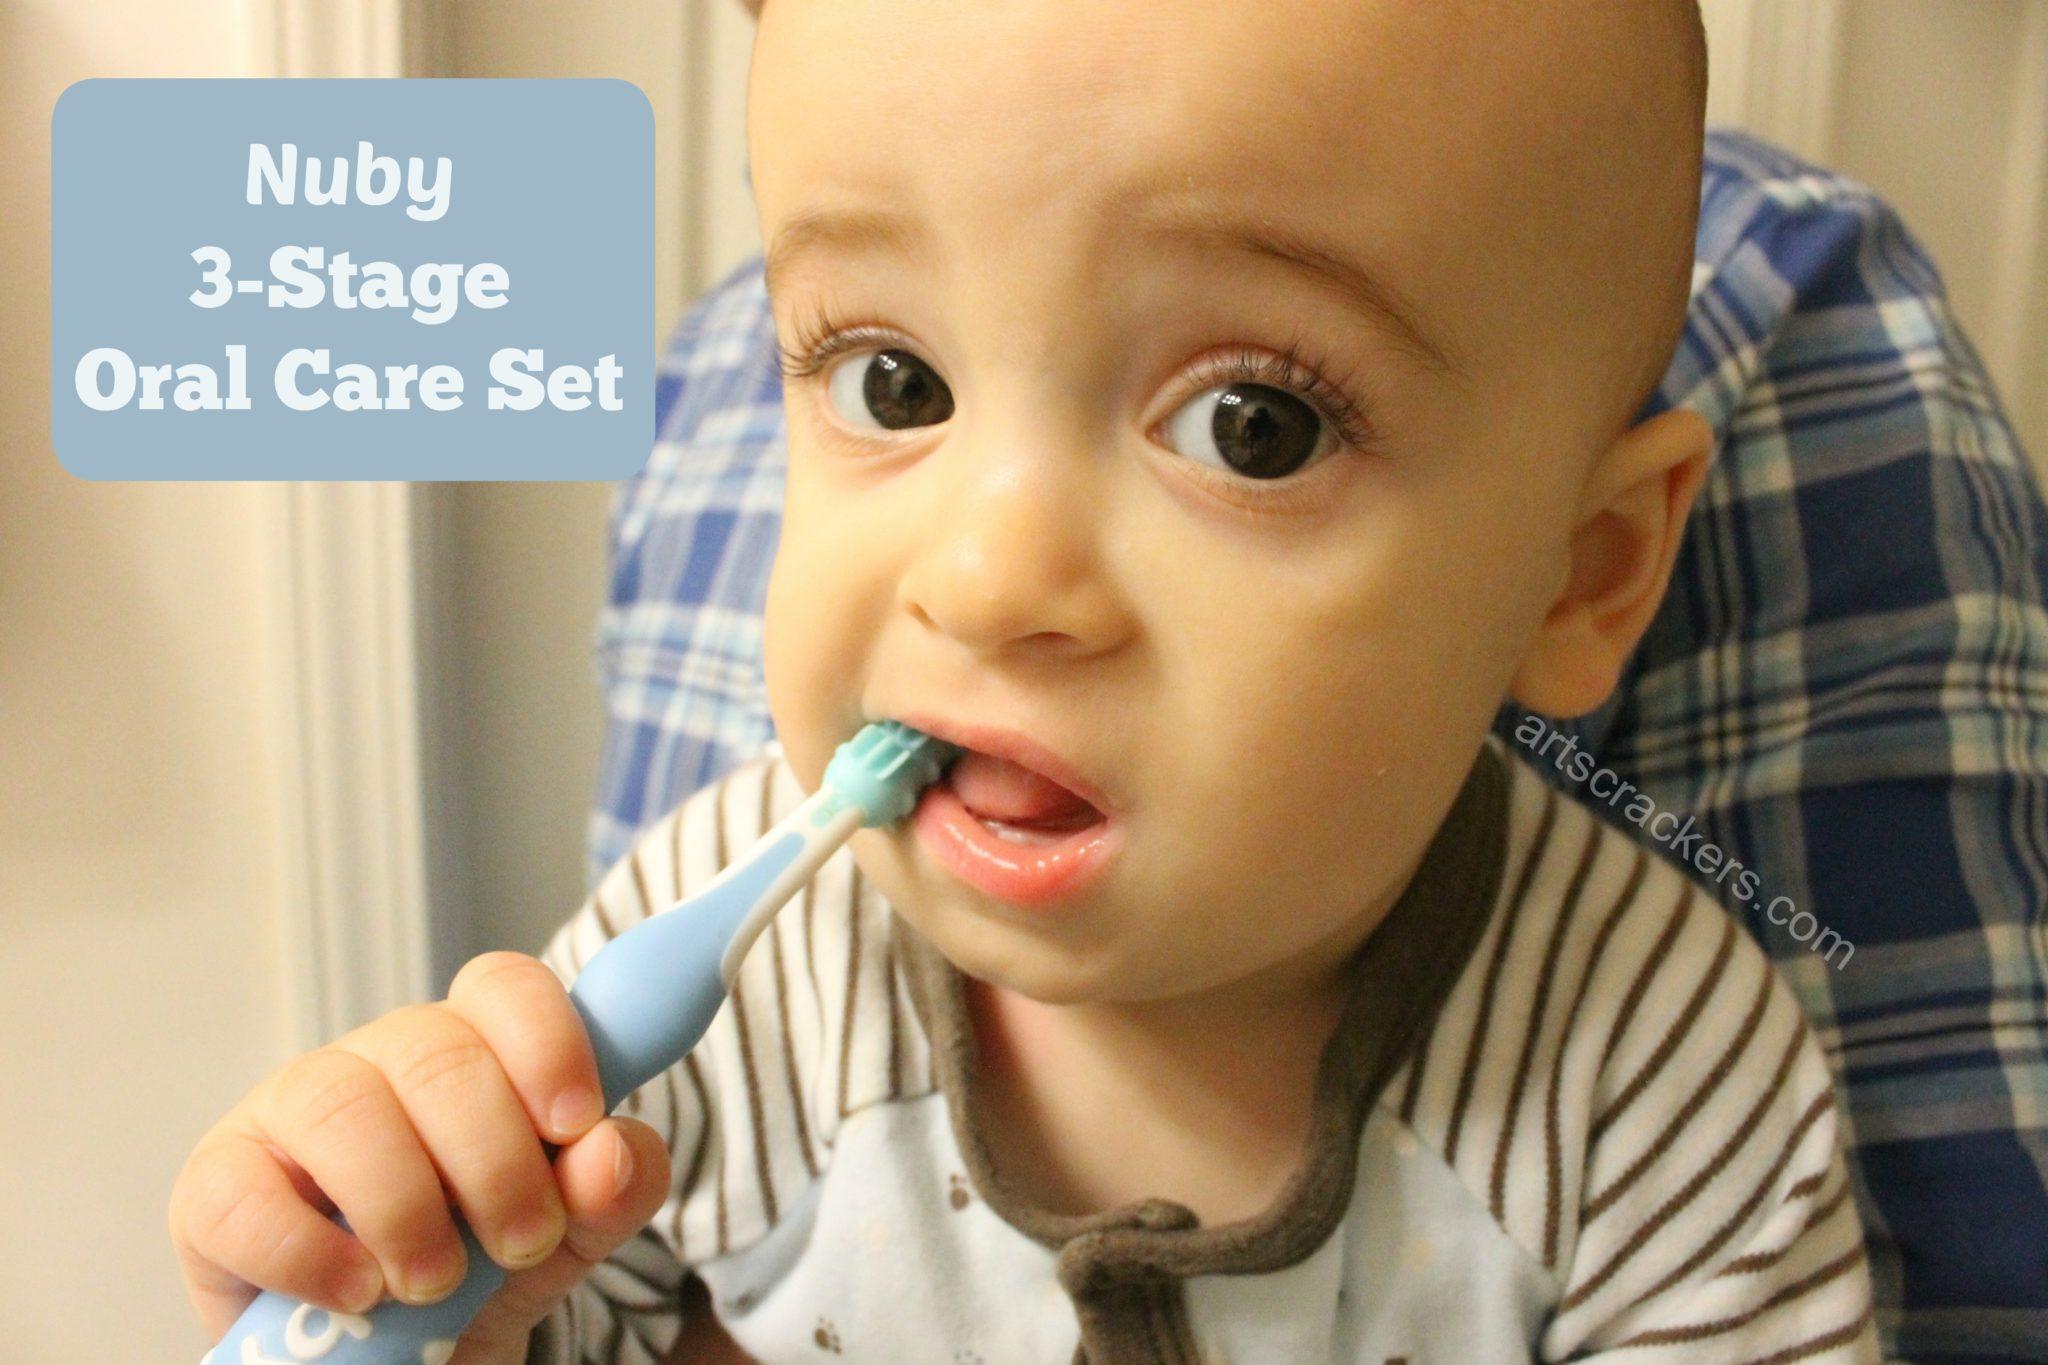 Nuby 3 Stage Oral Care Set